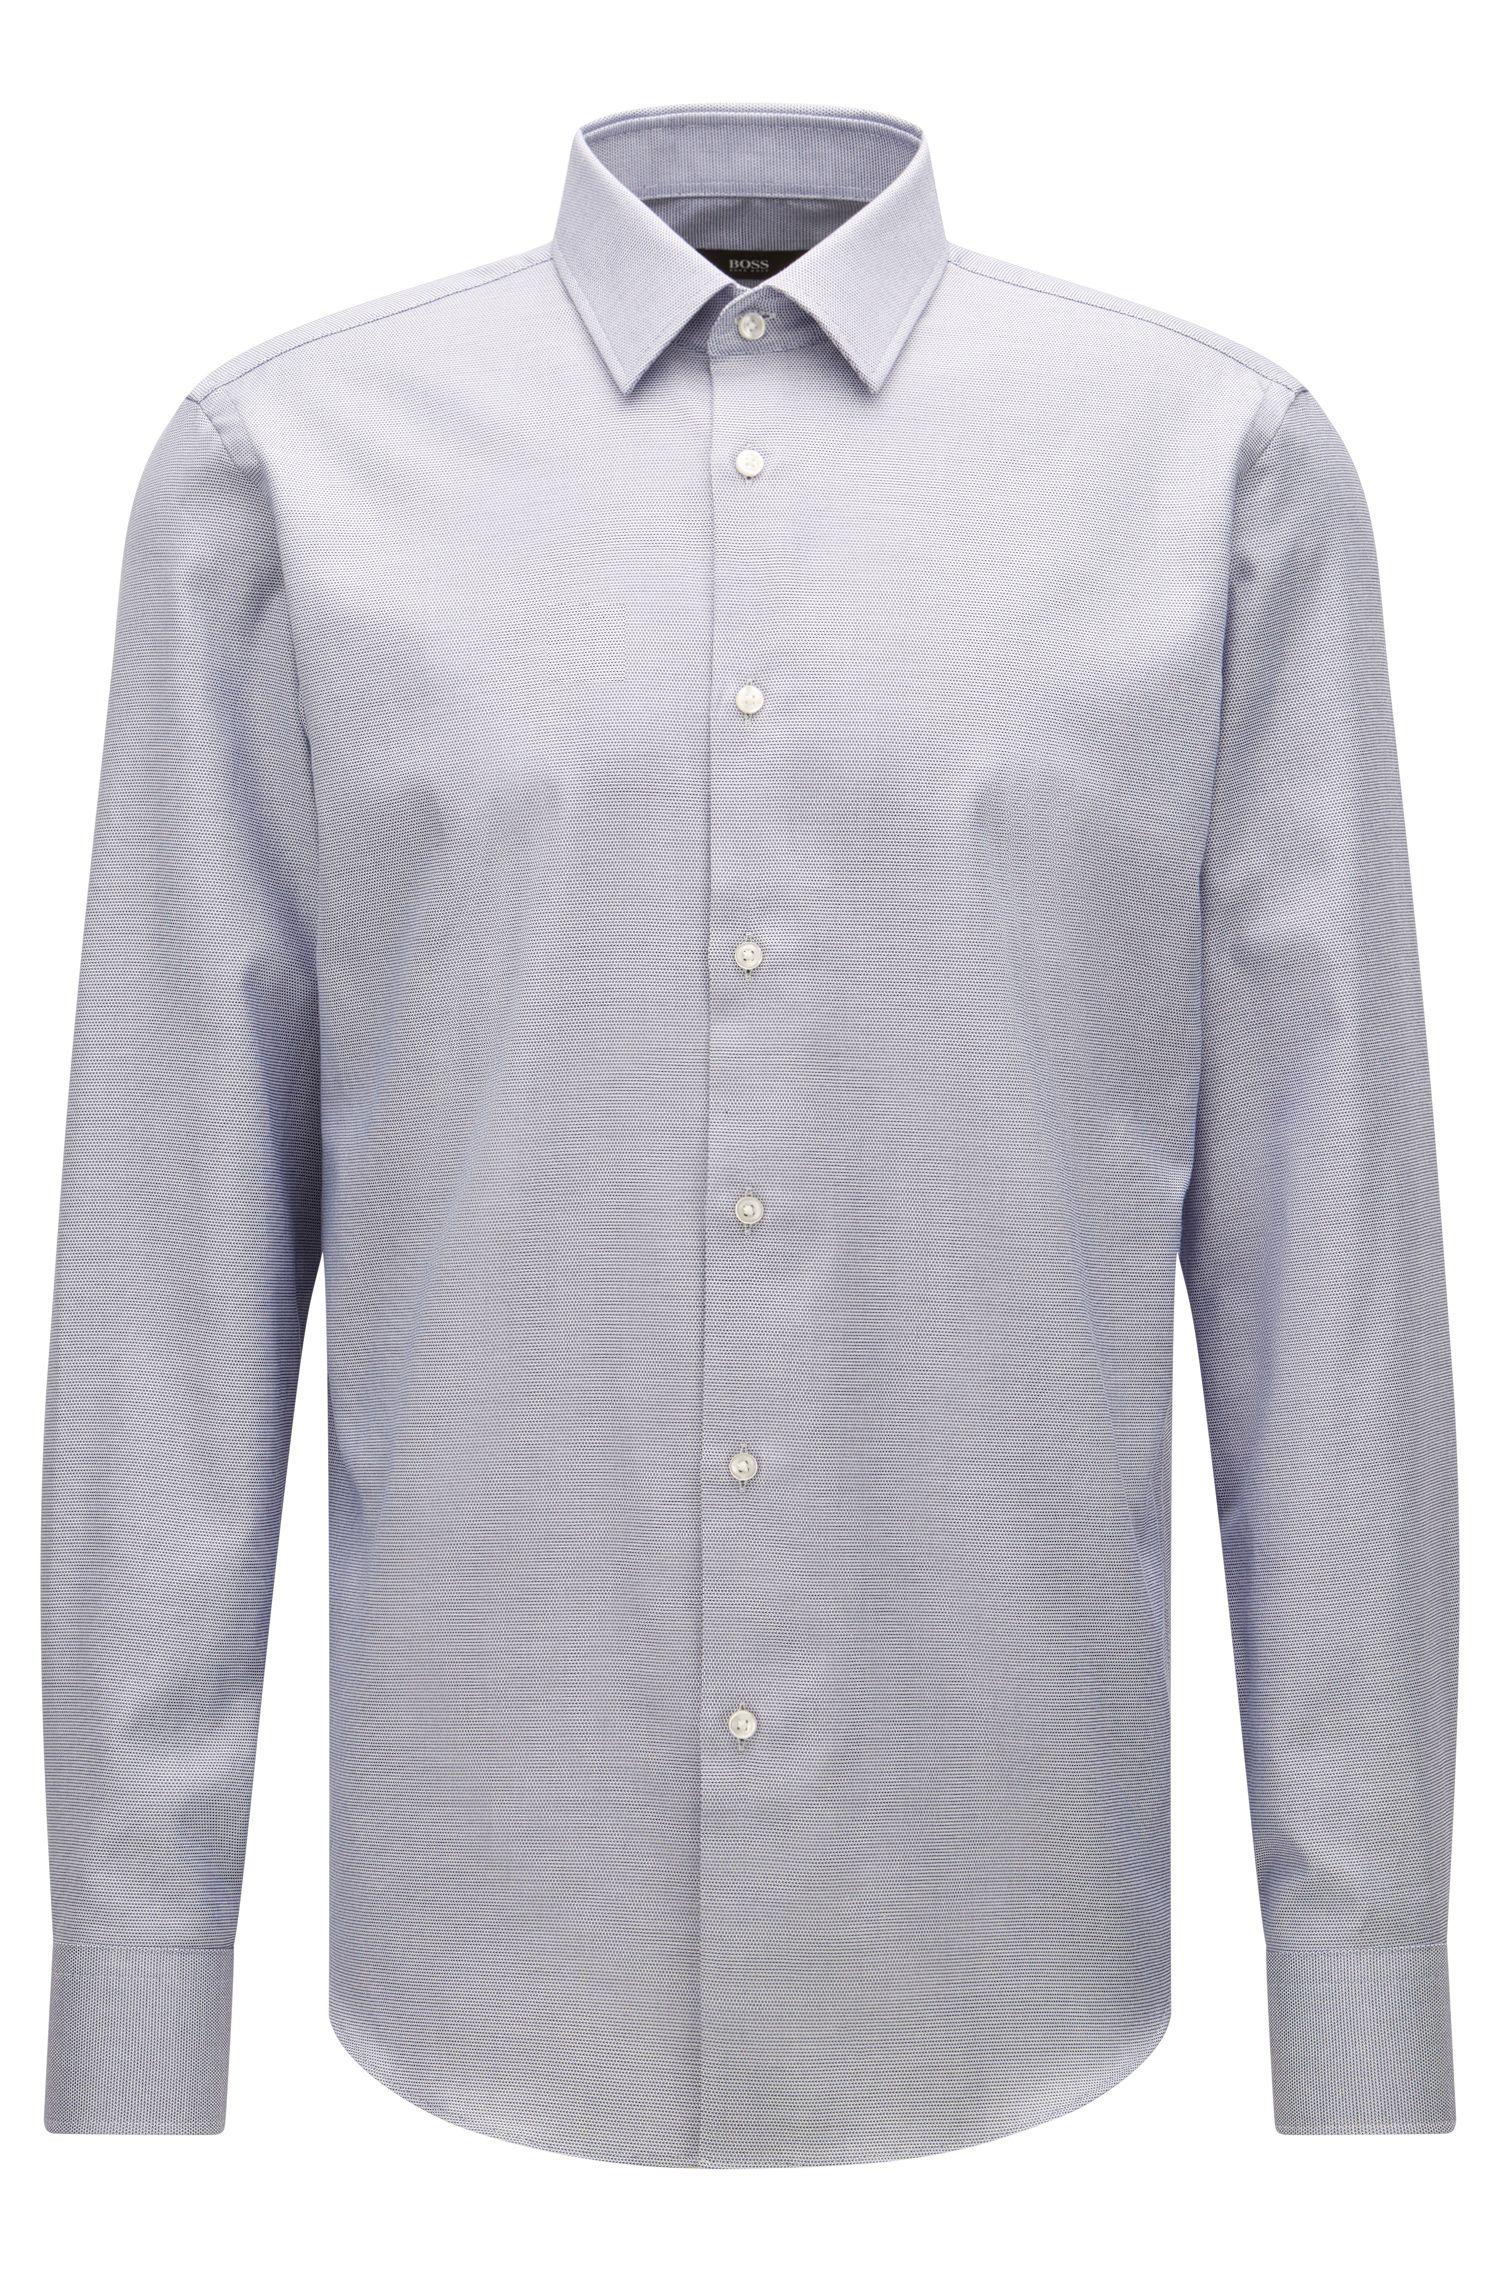 Regular-fit shirt in Egyptian cotton